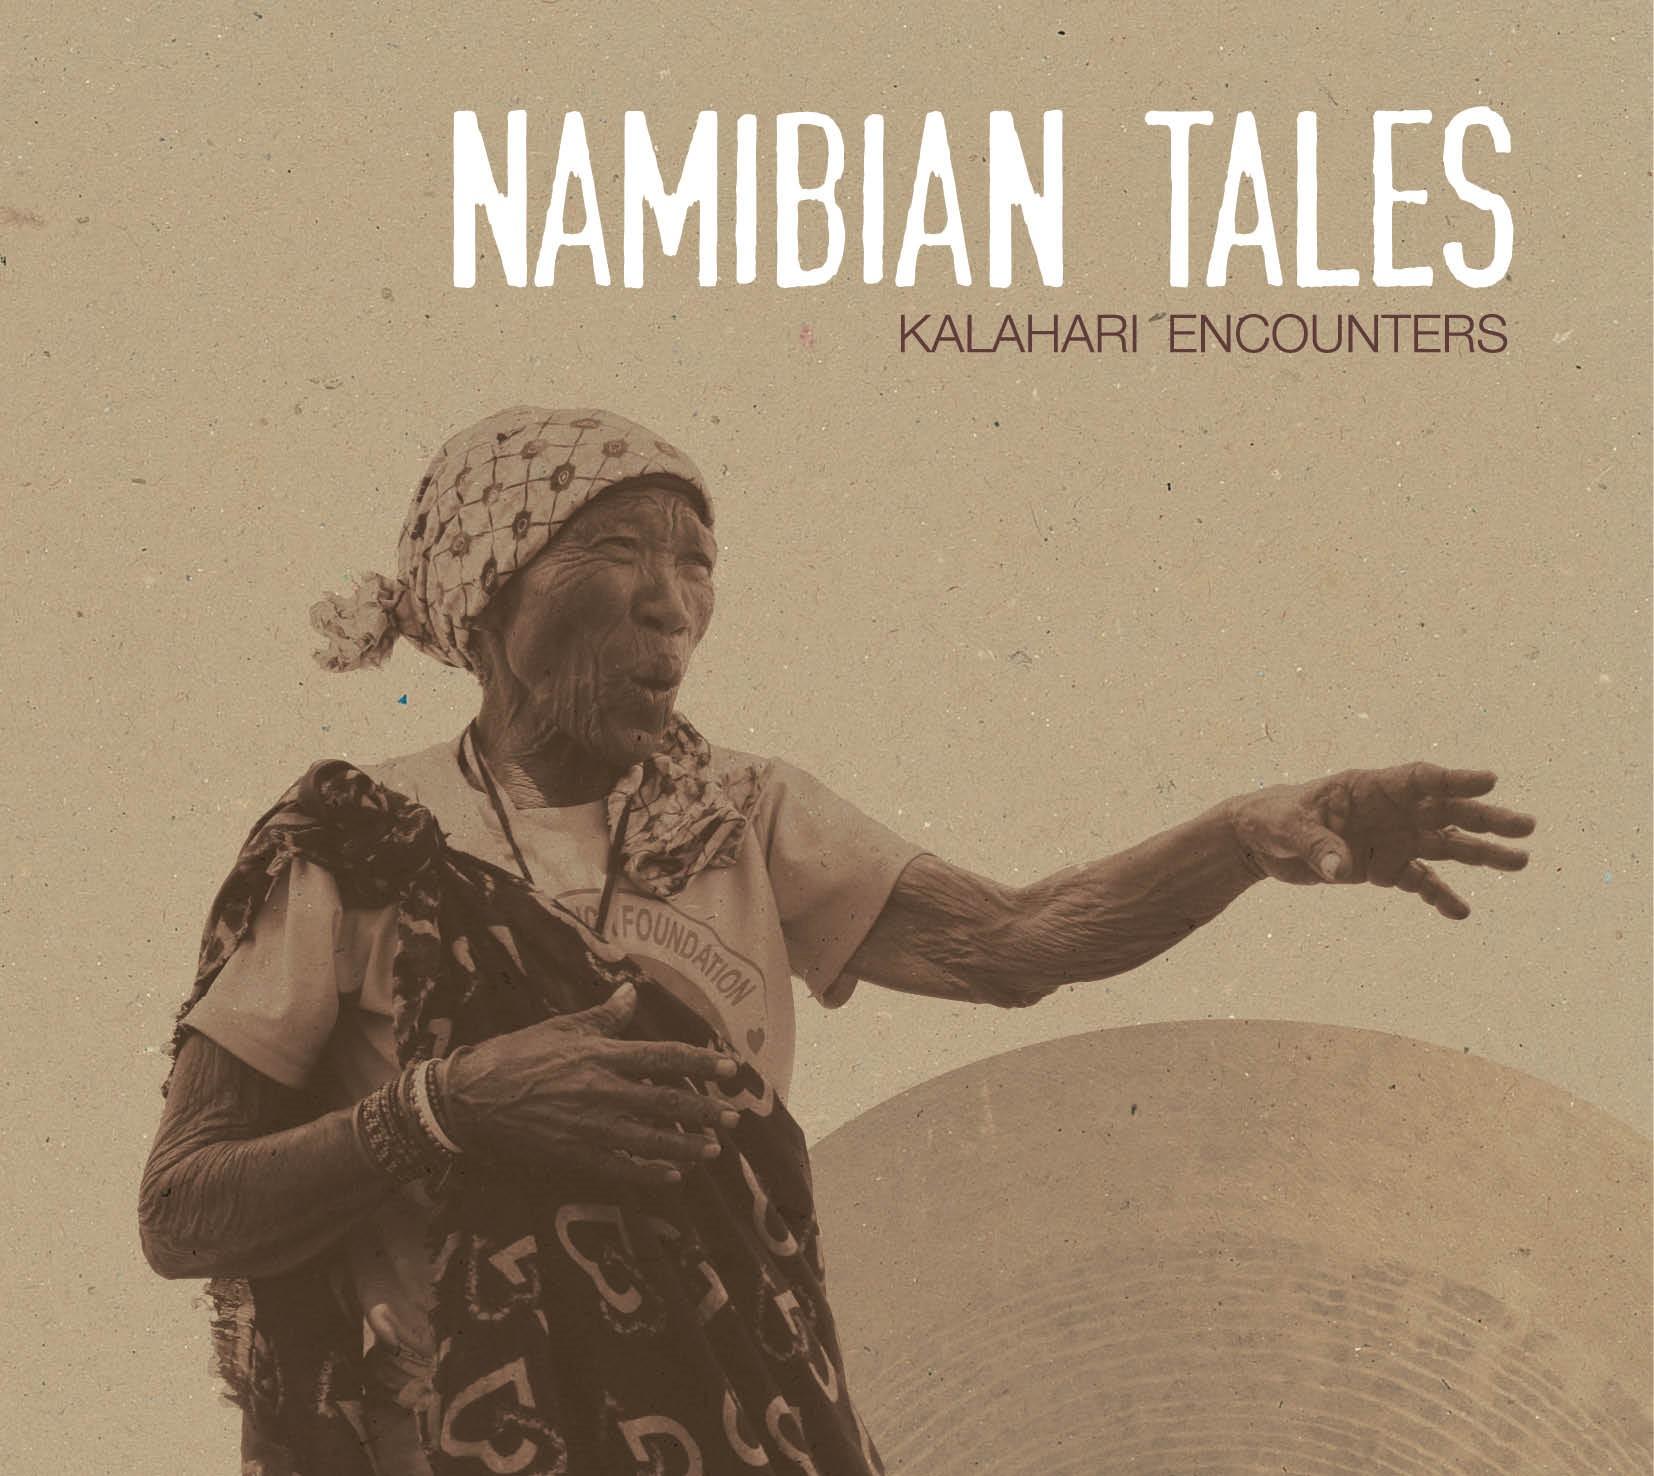 Namibian Tales